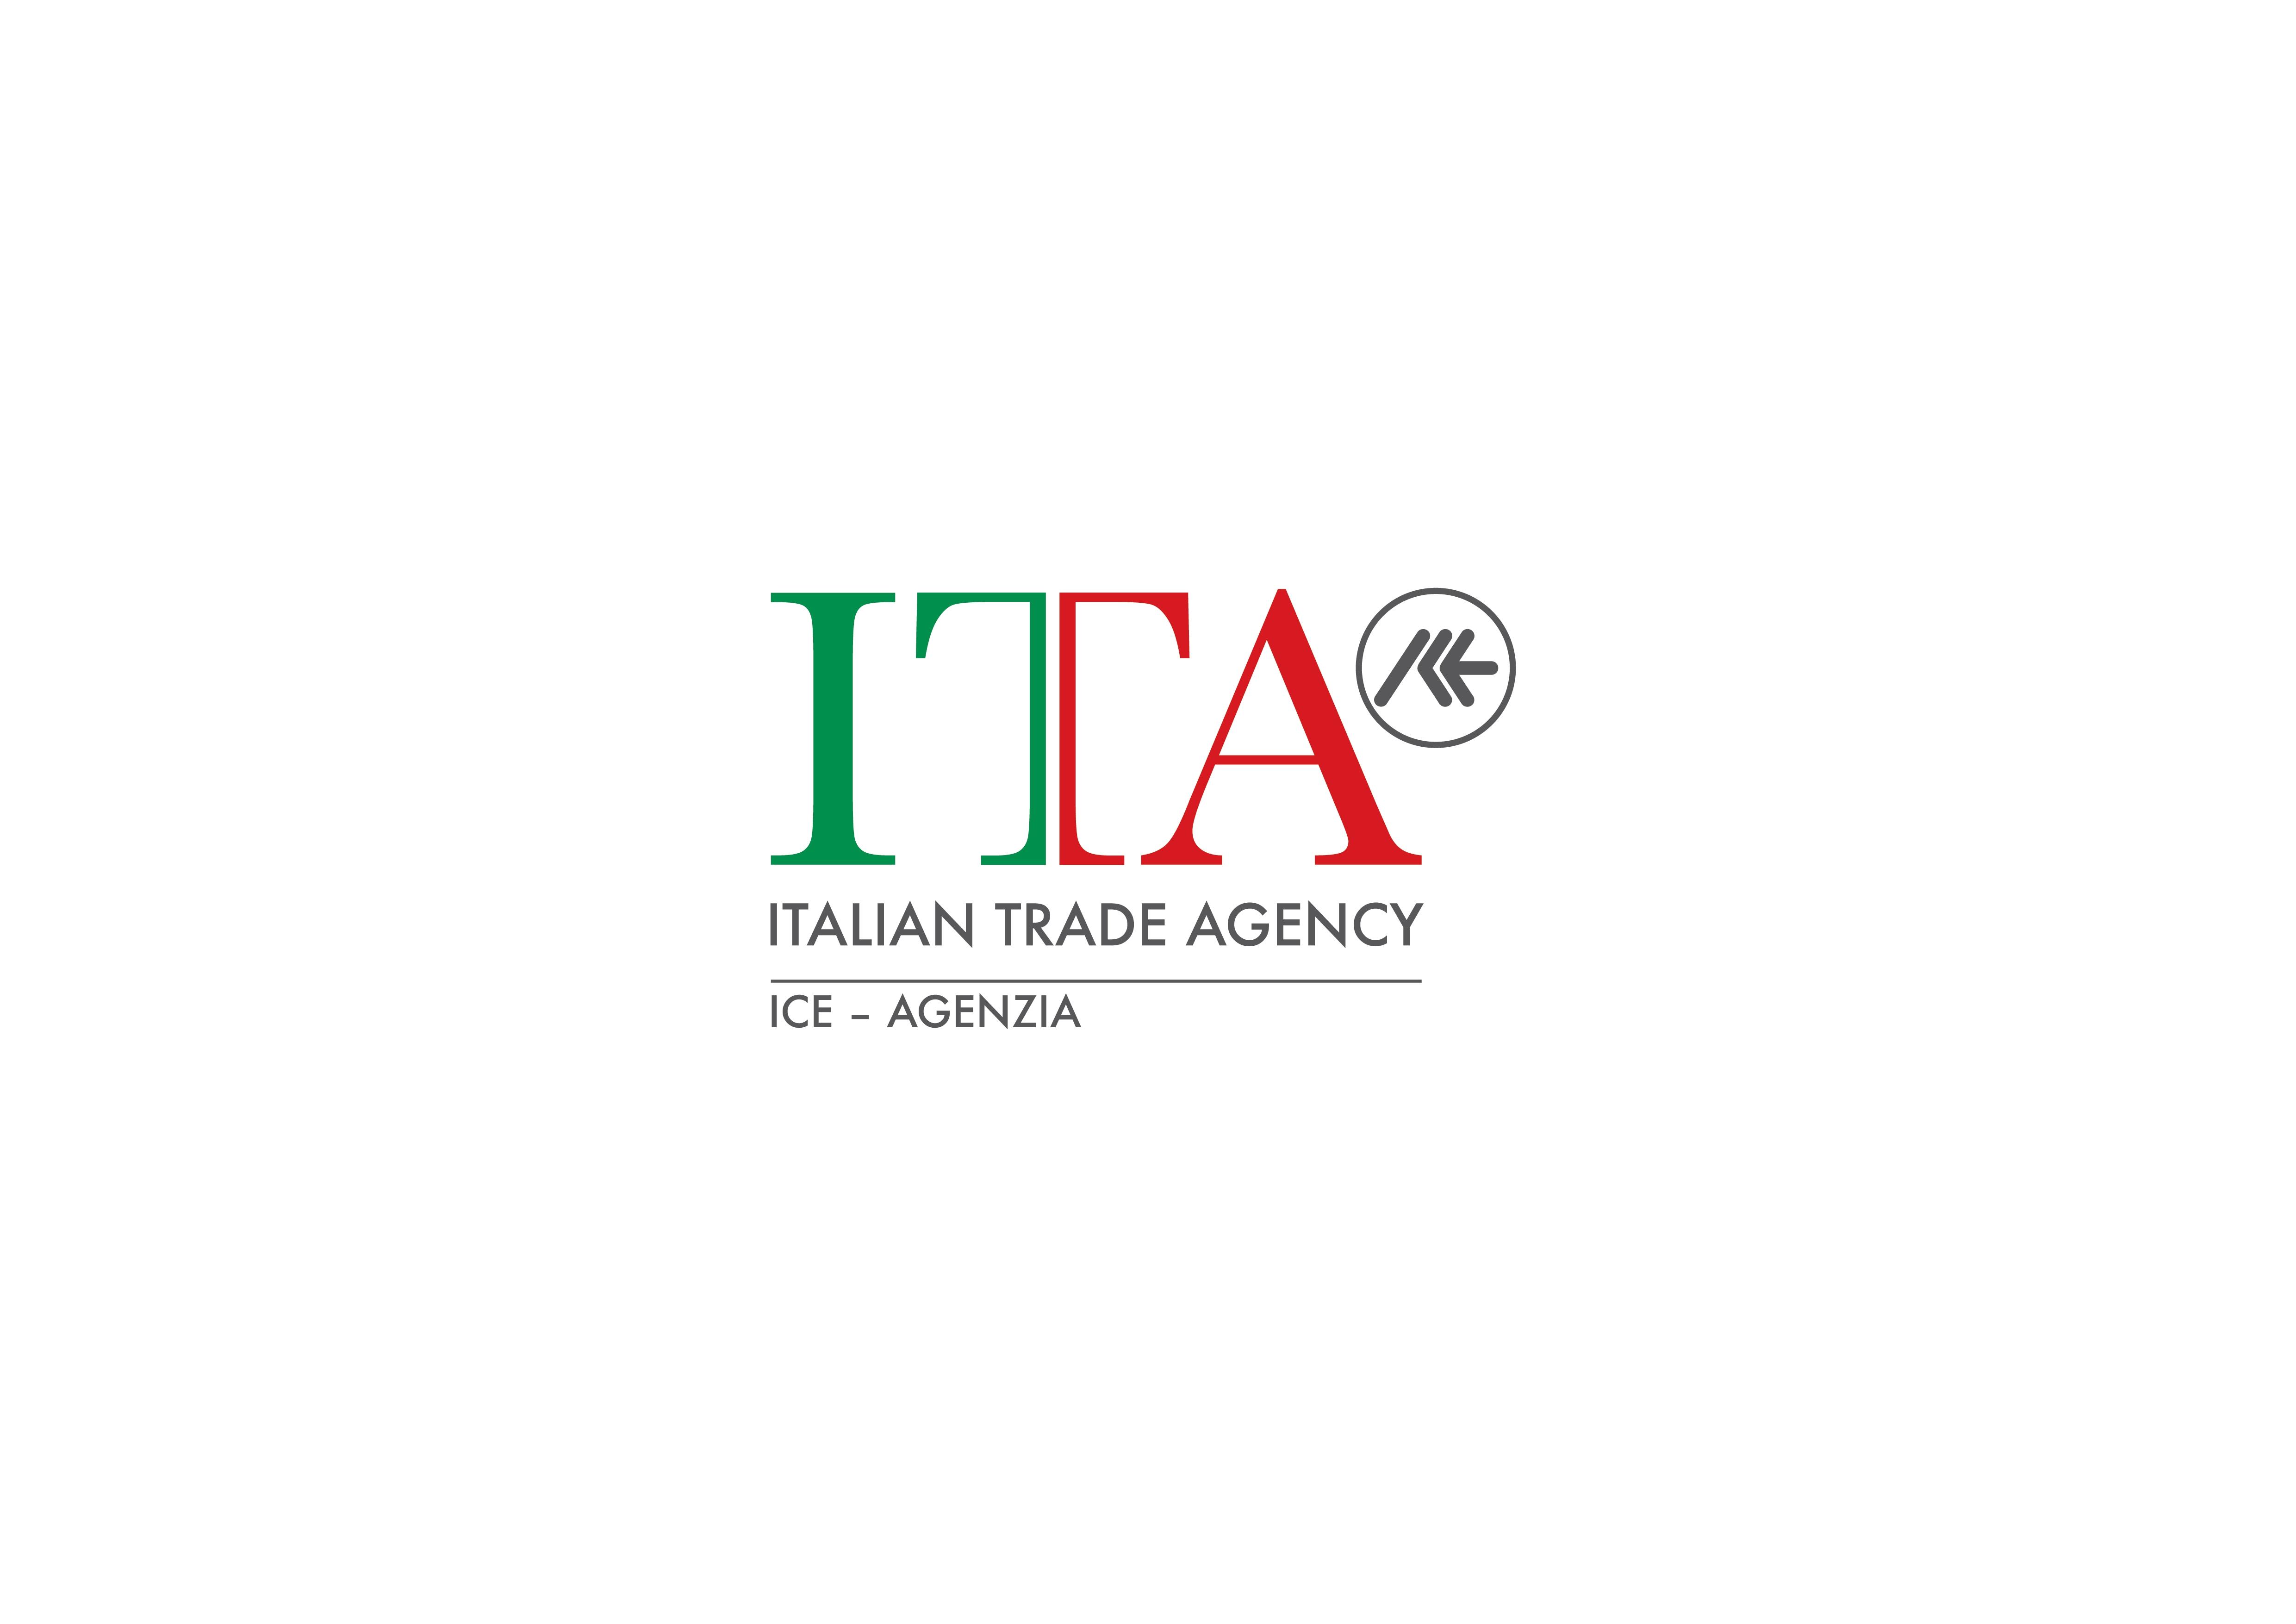 INSTITUT ITALIEN COMMERCE EXTERIEUR